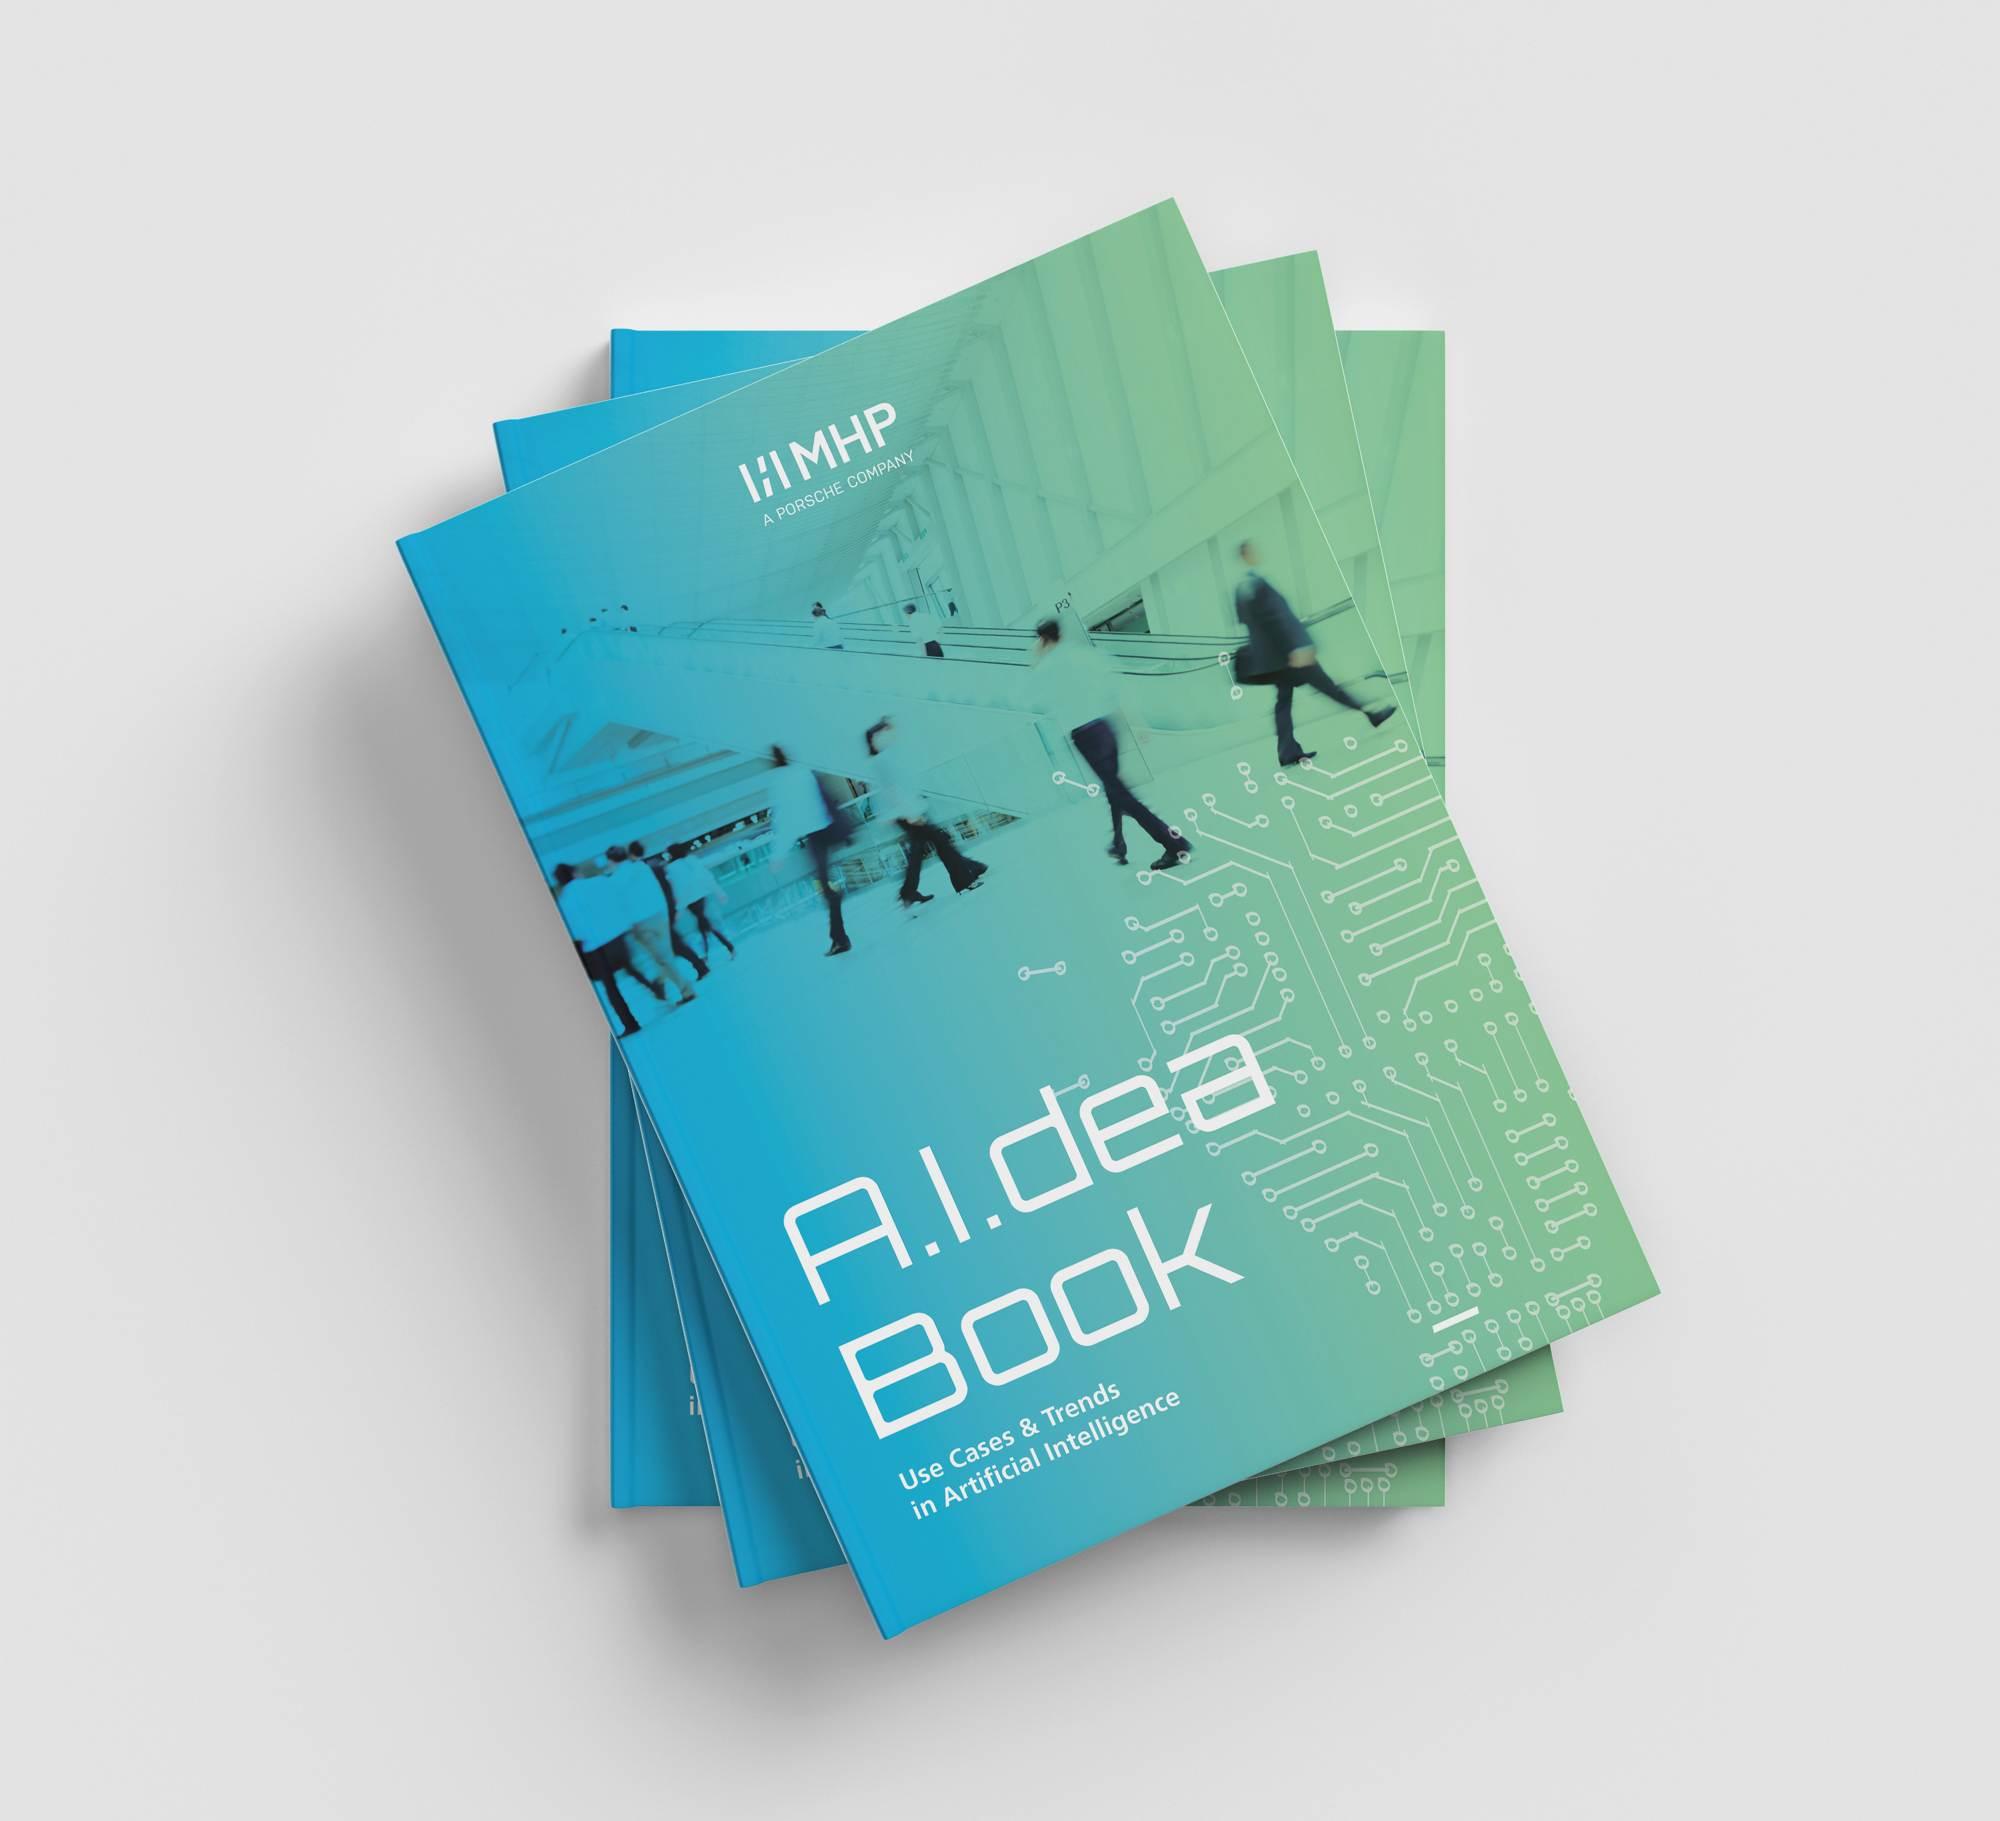 Freiland-Design_Hard_Cover_A4_Book_Mockup_1